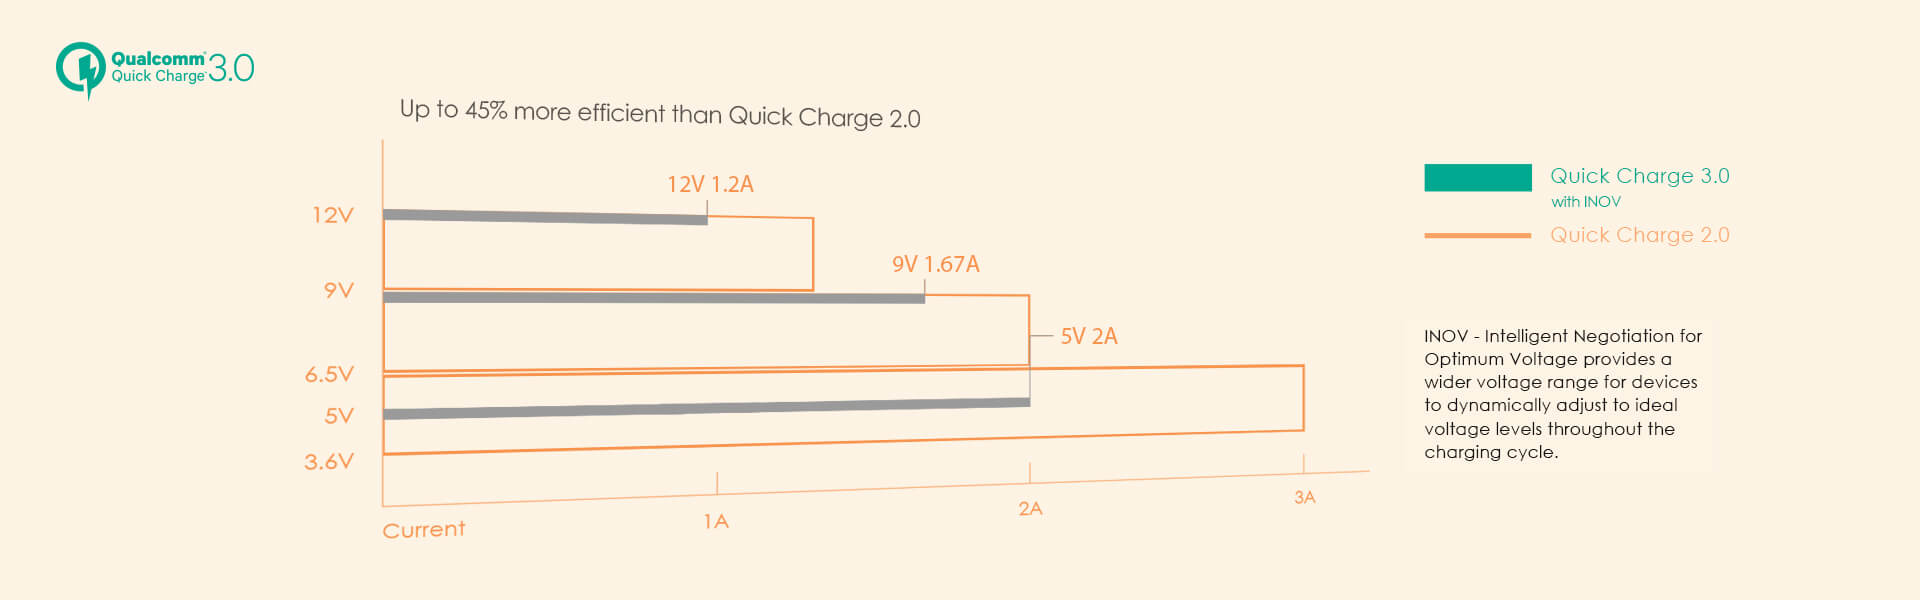 quick-charge-3.0-pr.jpg